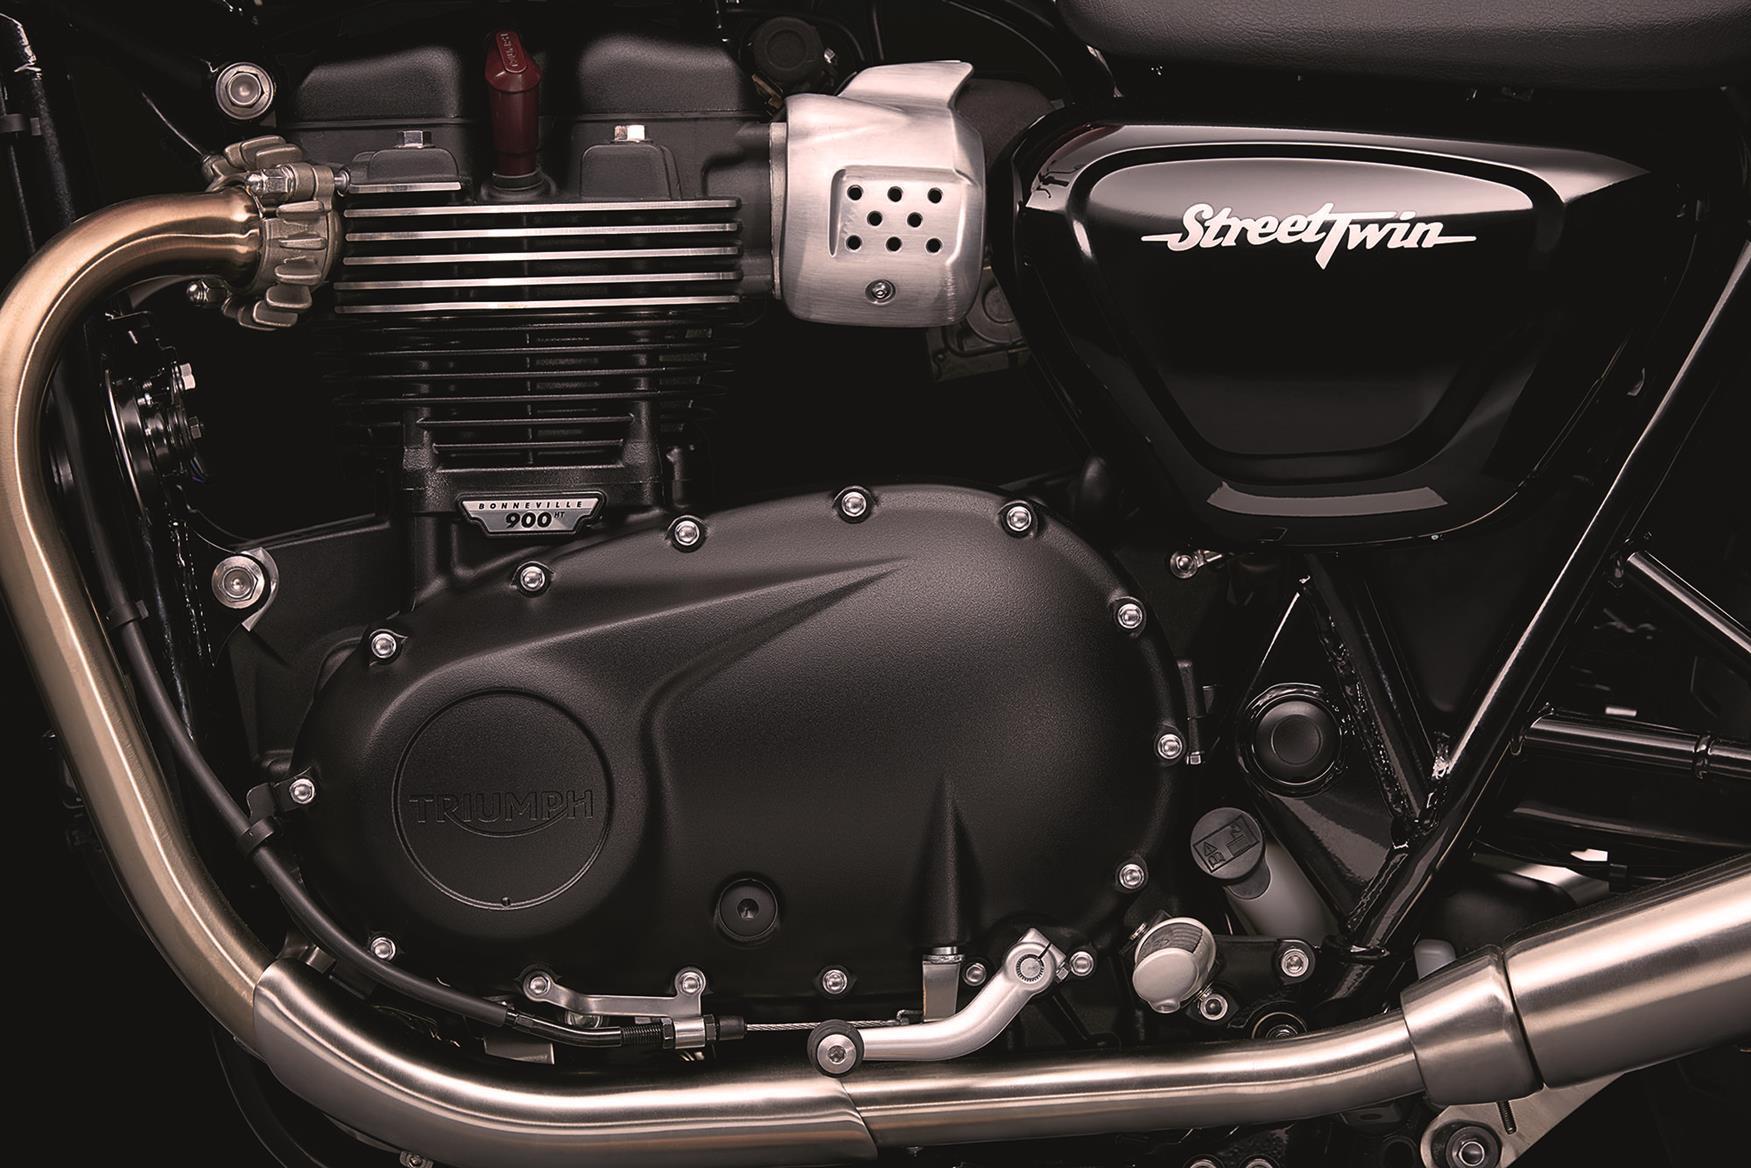 2016 Triumph Street Twin engine